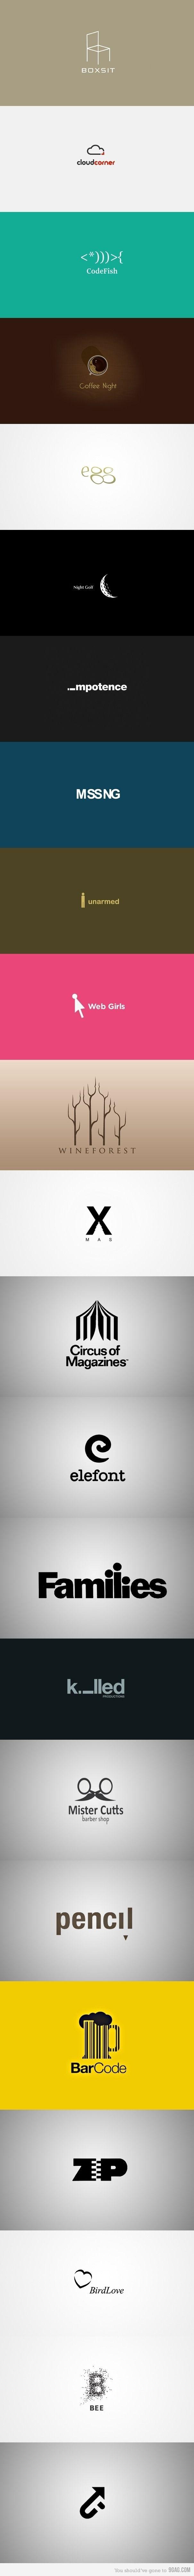 Cassandra cappello graphic design toronto - 104 Best Images About Logo Design On Pinterest Logo Branding Branding Design And Typography